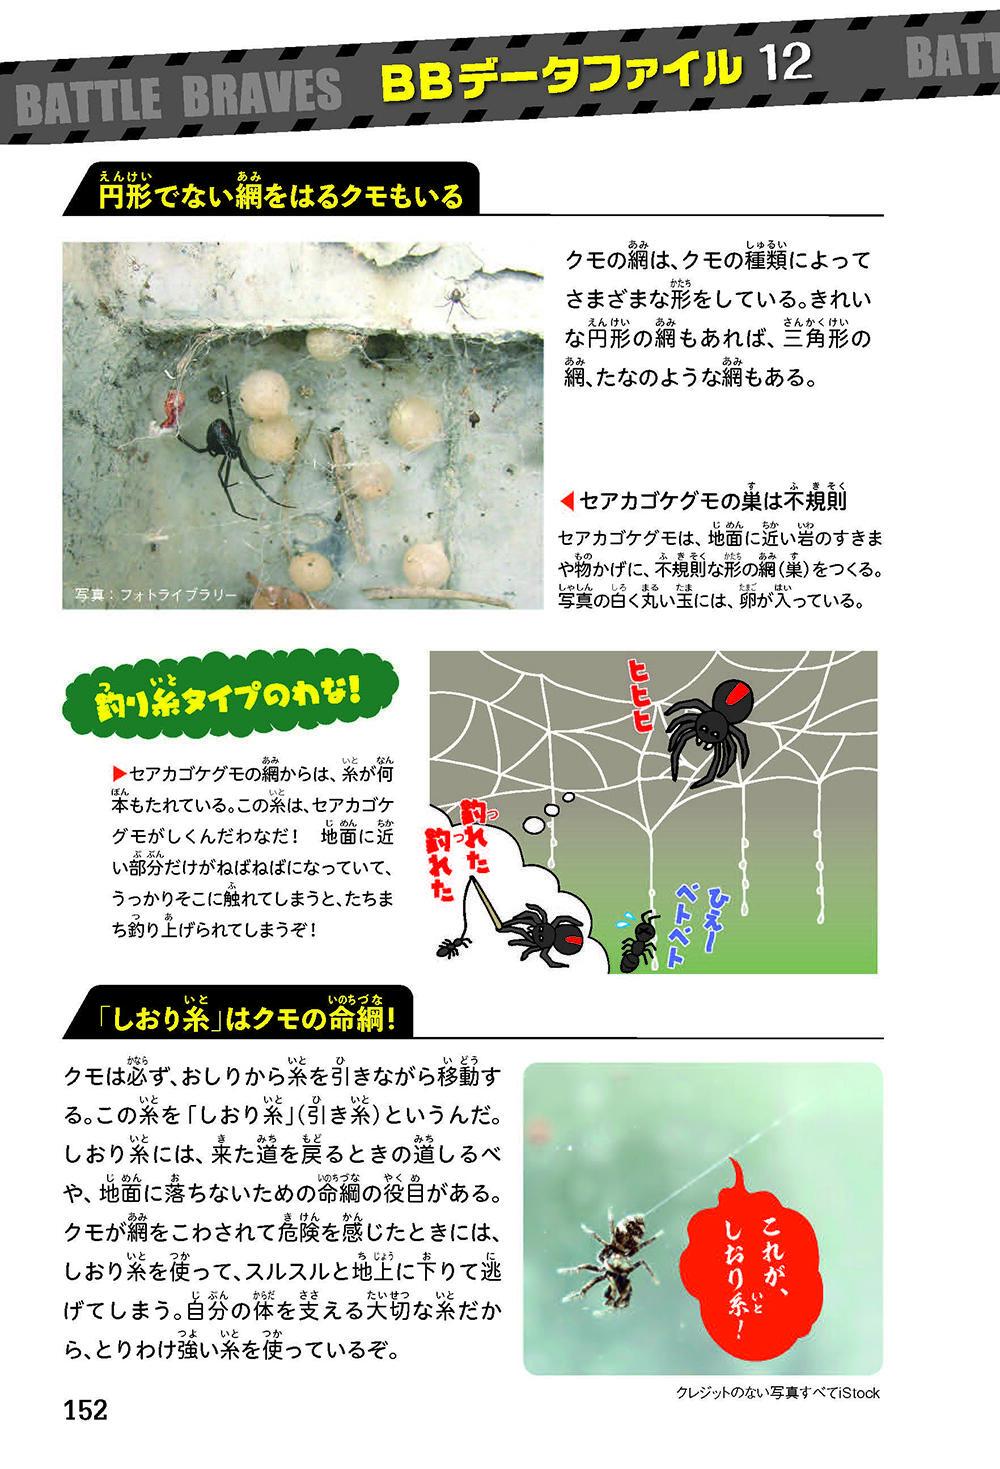 BB_蜊ア髯コ逕溽黄_繝倥z繝シ繧キ繧兩152.jpg